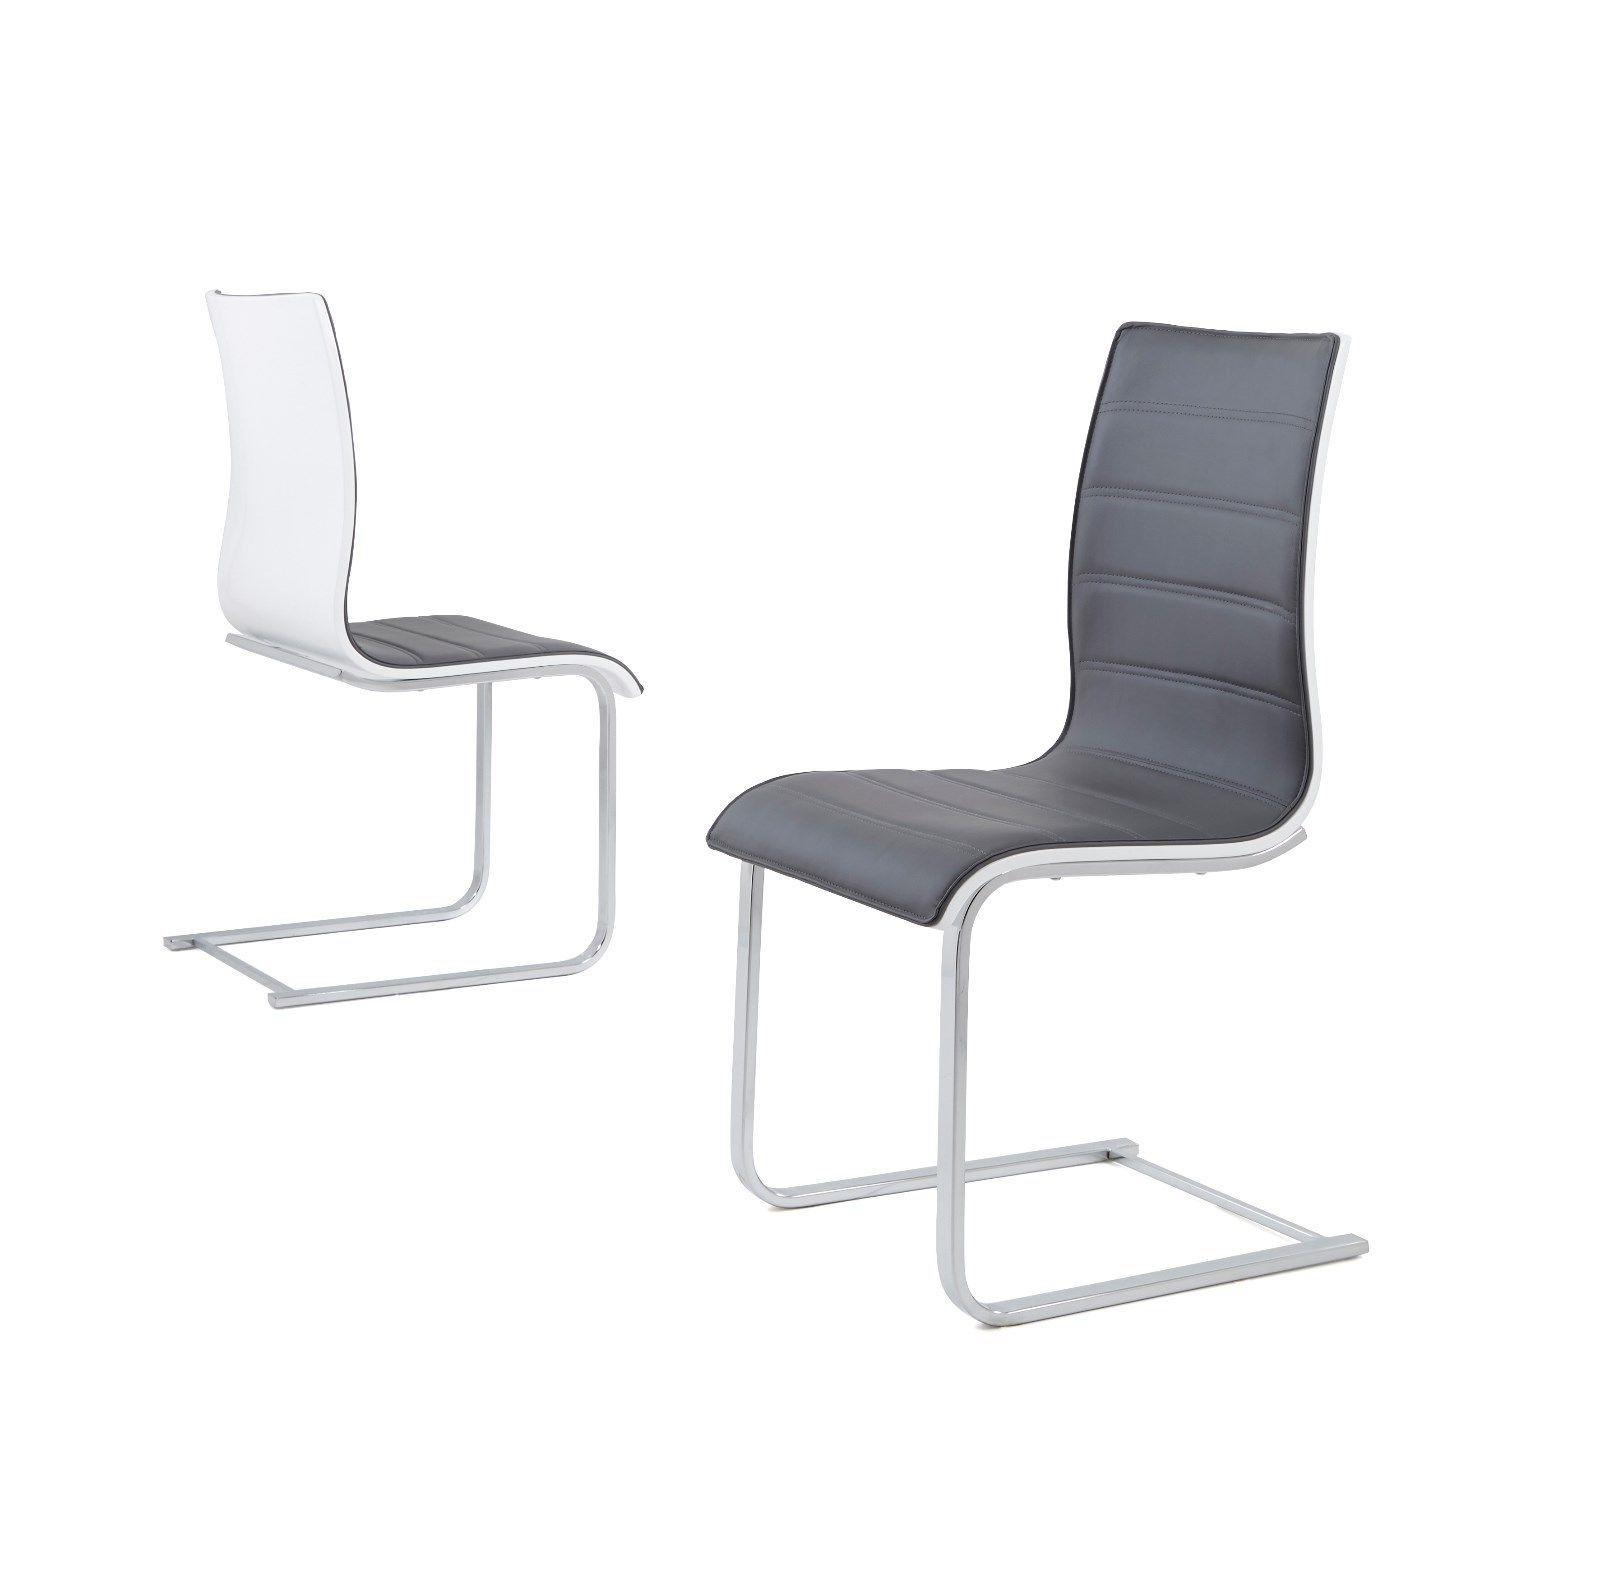 High Gloss Dining Chairs Regarding Newest Wynn High Gloss Back Dining Chairs Only – Grey & White (View 11 of 25)